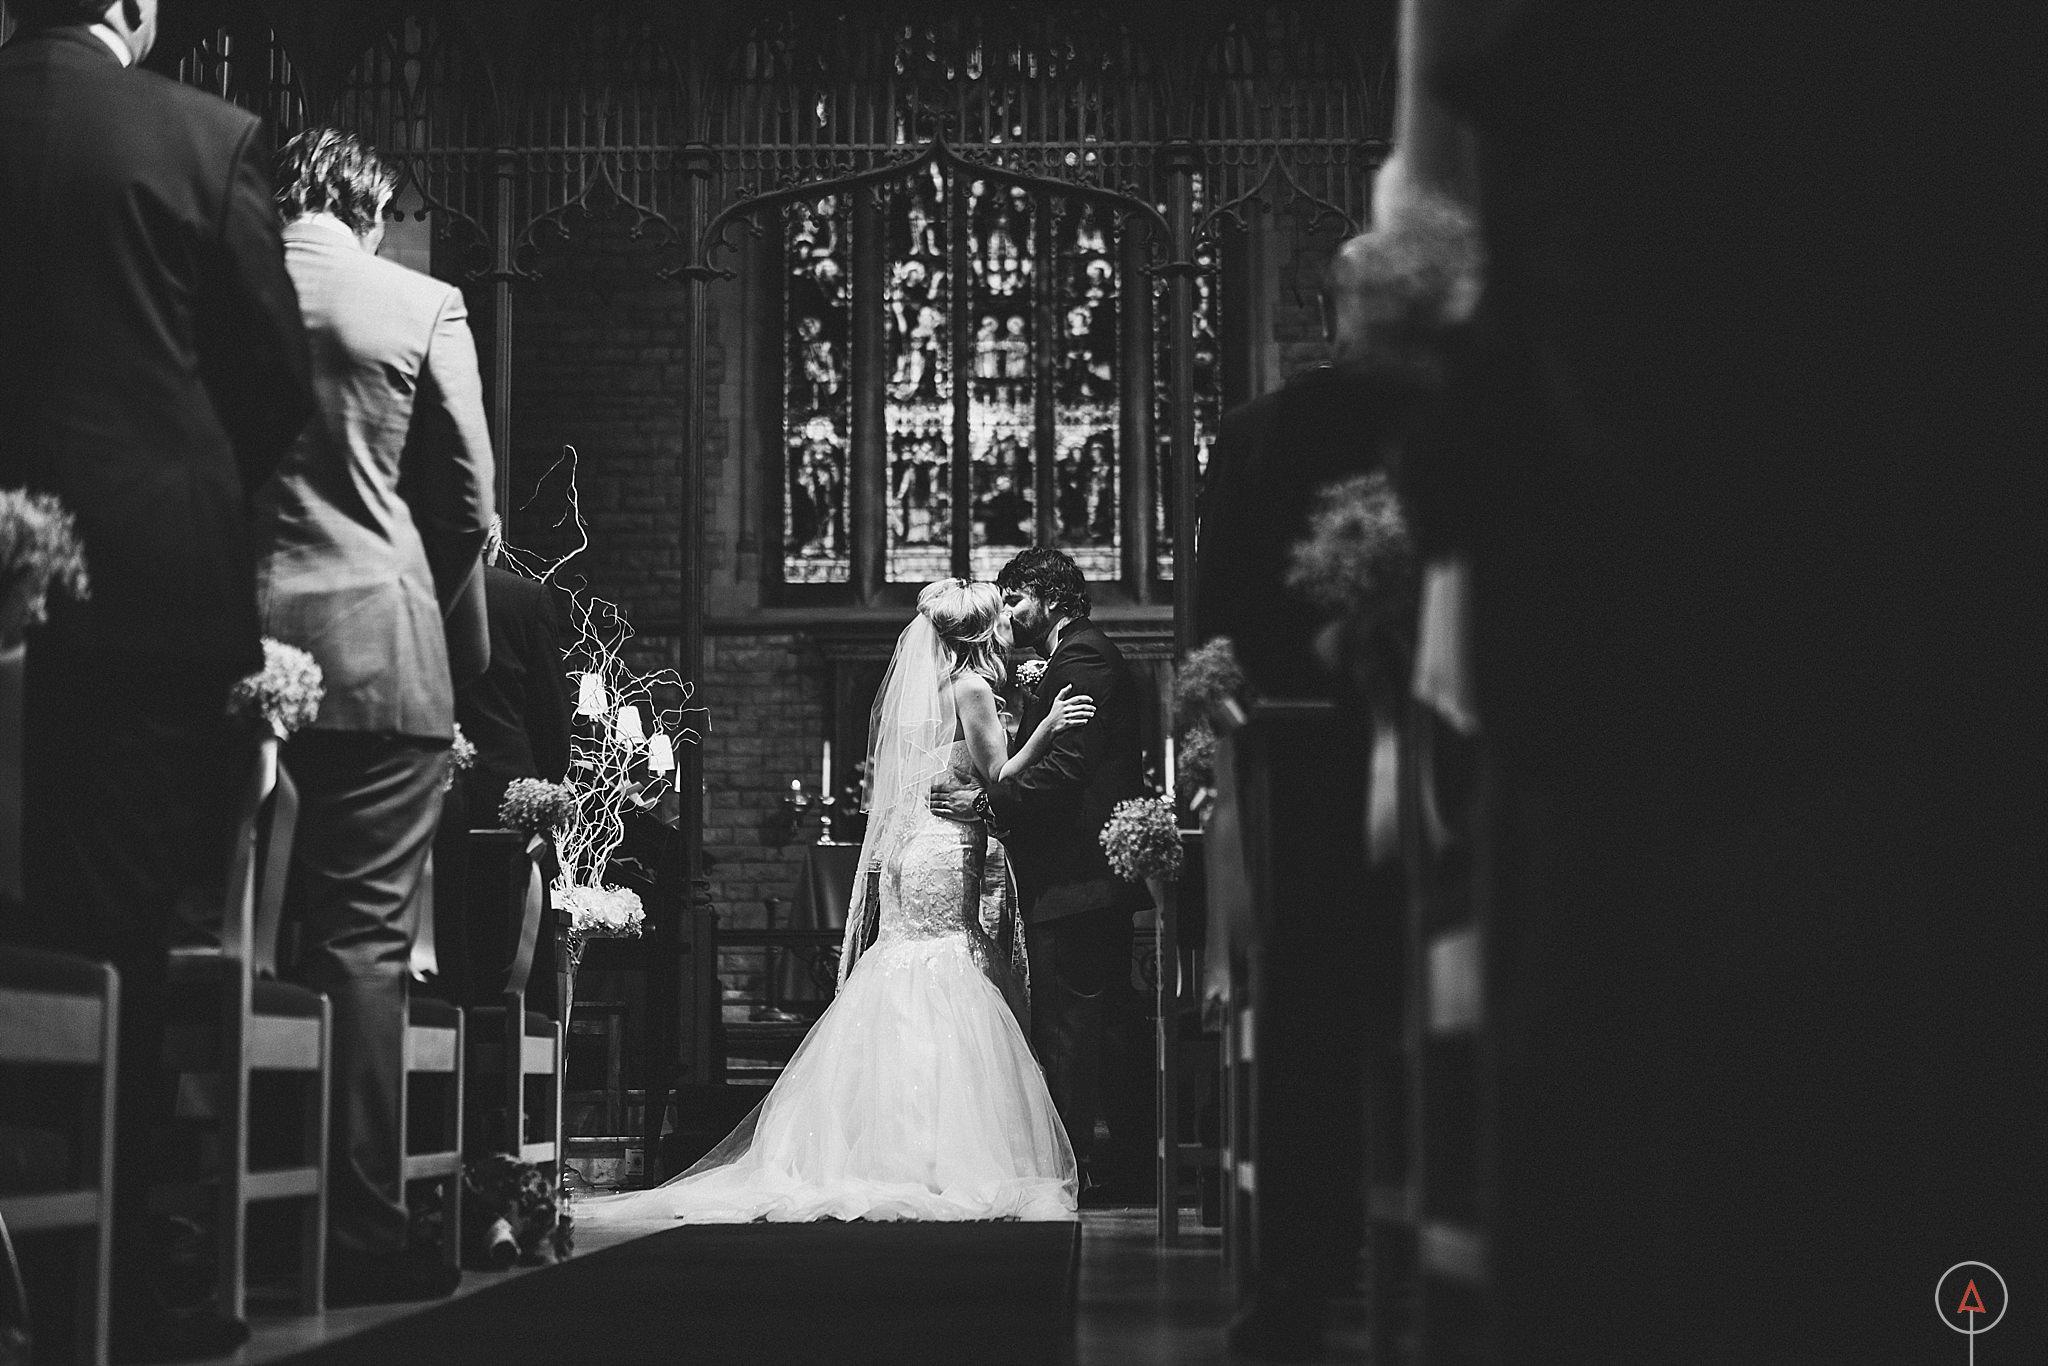 cardiff-wedding-photographer-aga-tomaszek_0364